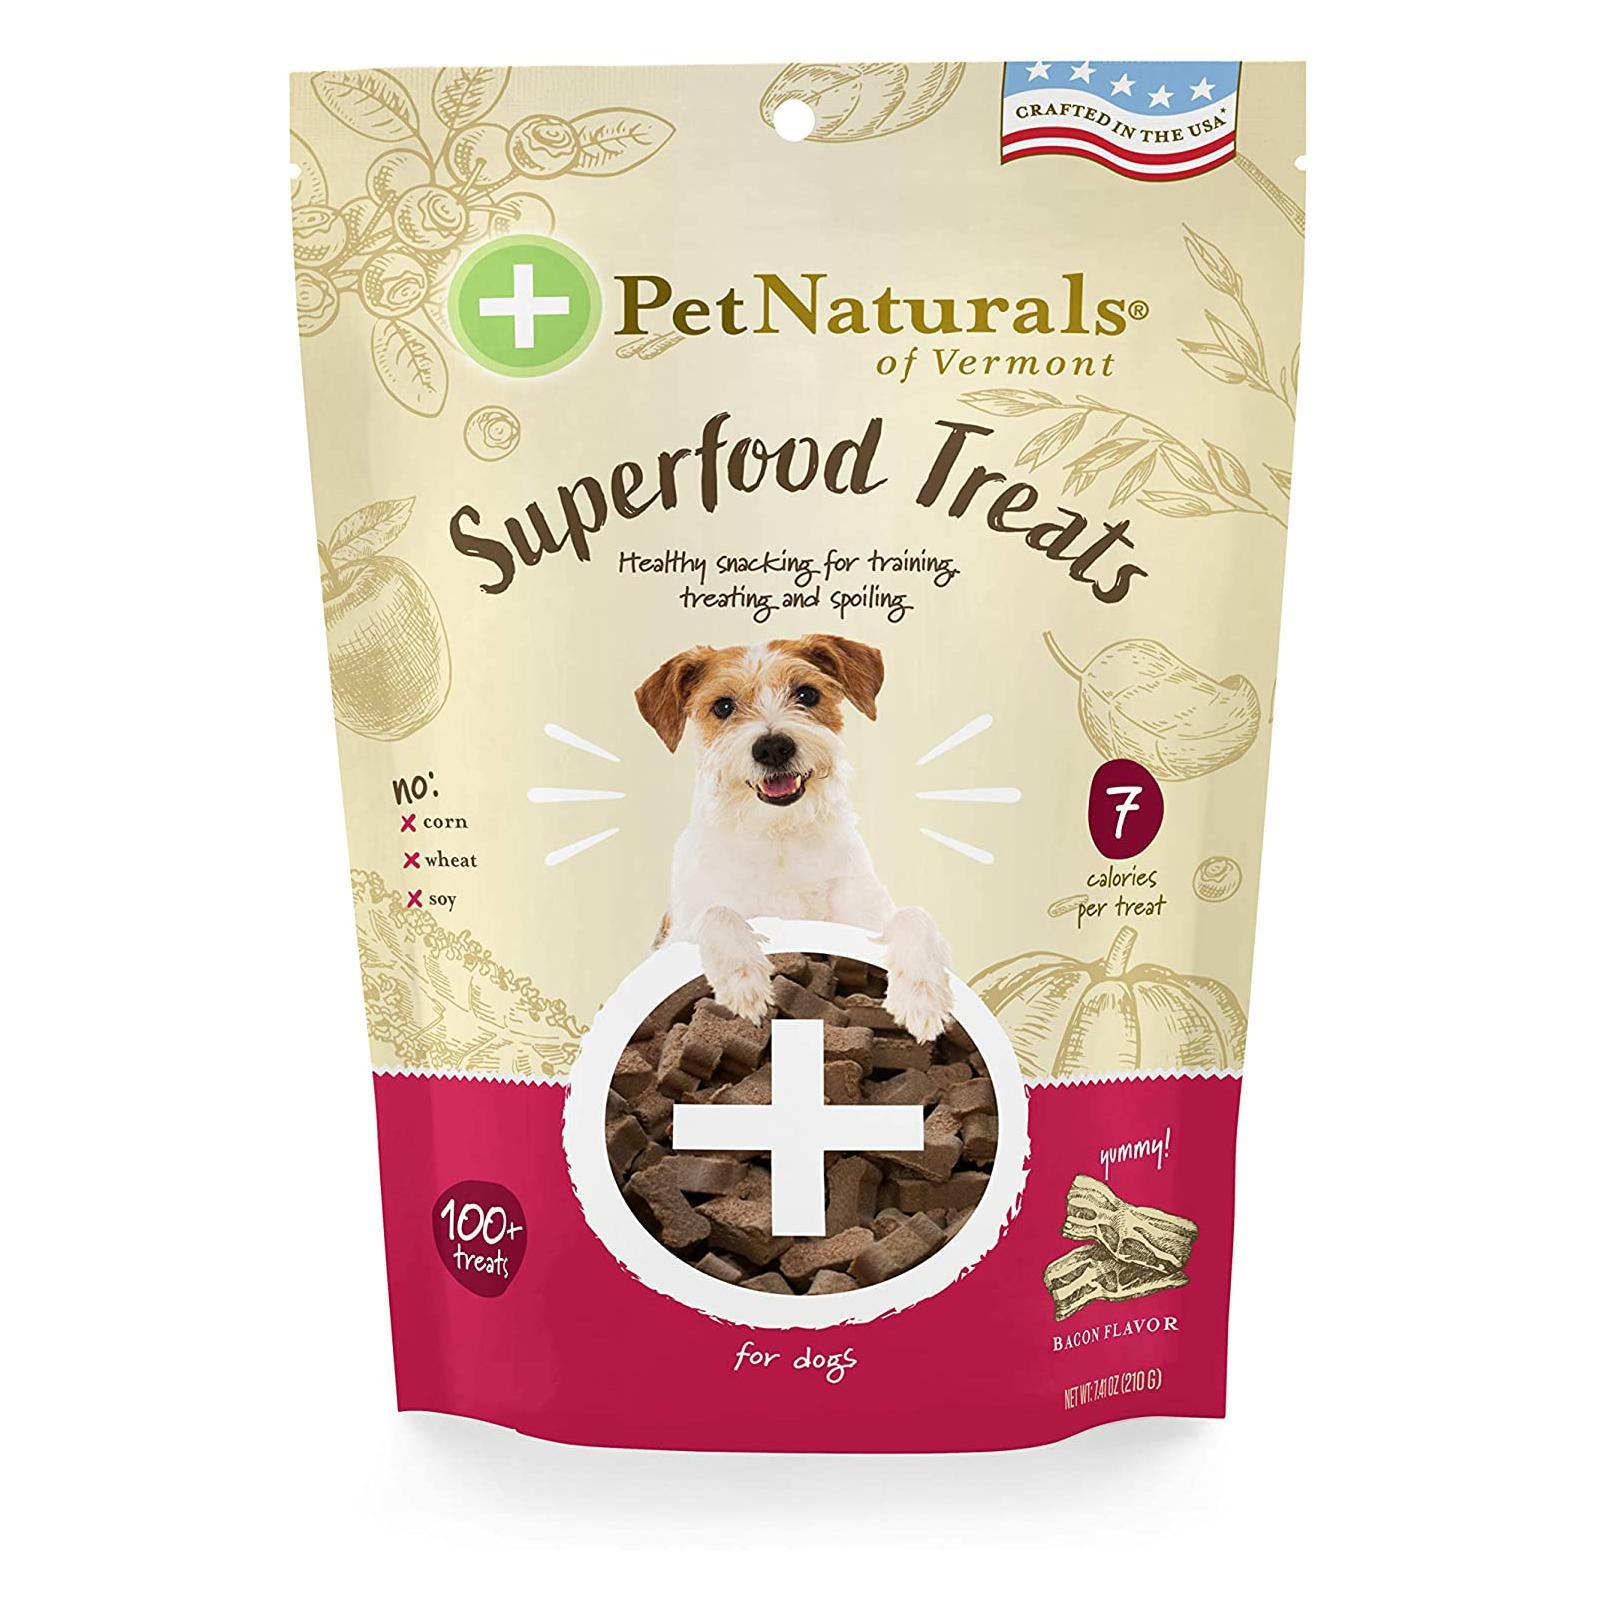 Pet Naturals Superfood Dog Treats - Crispy Bacon Flavor